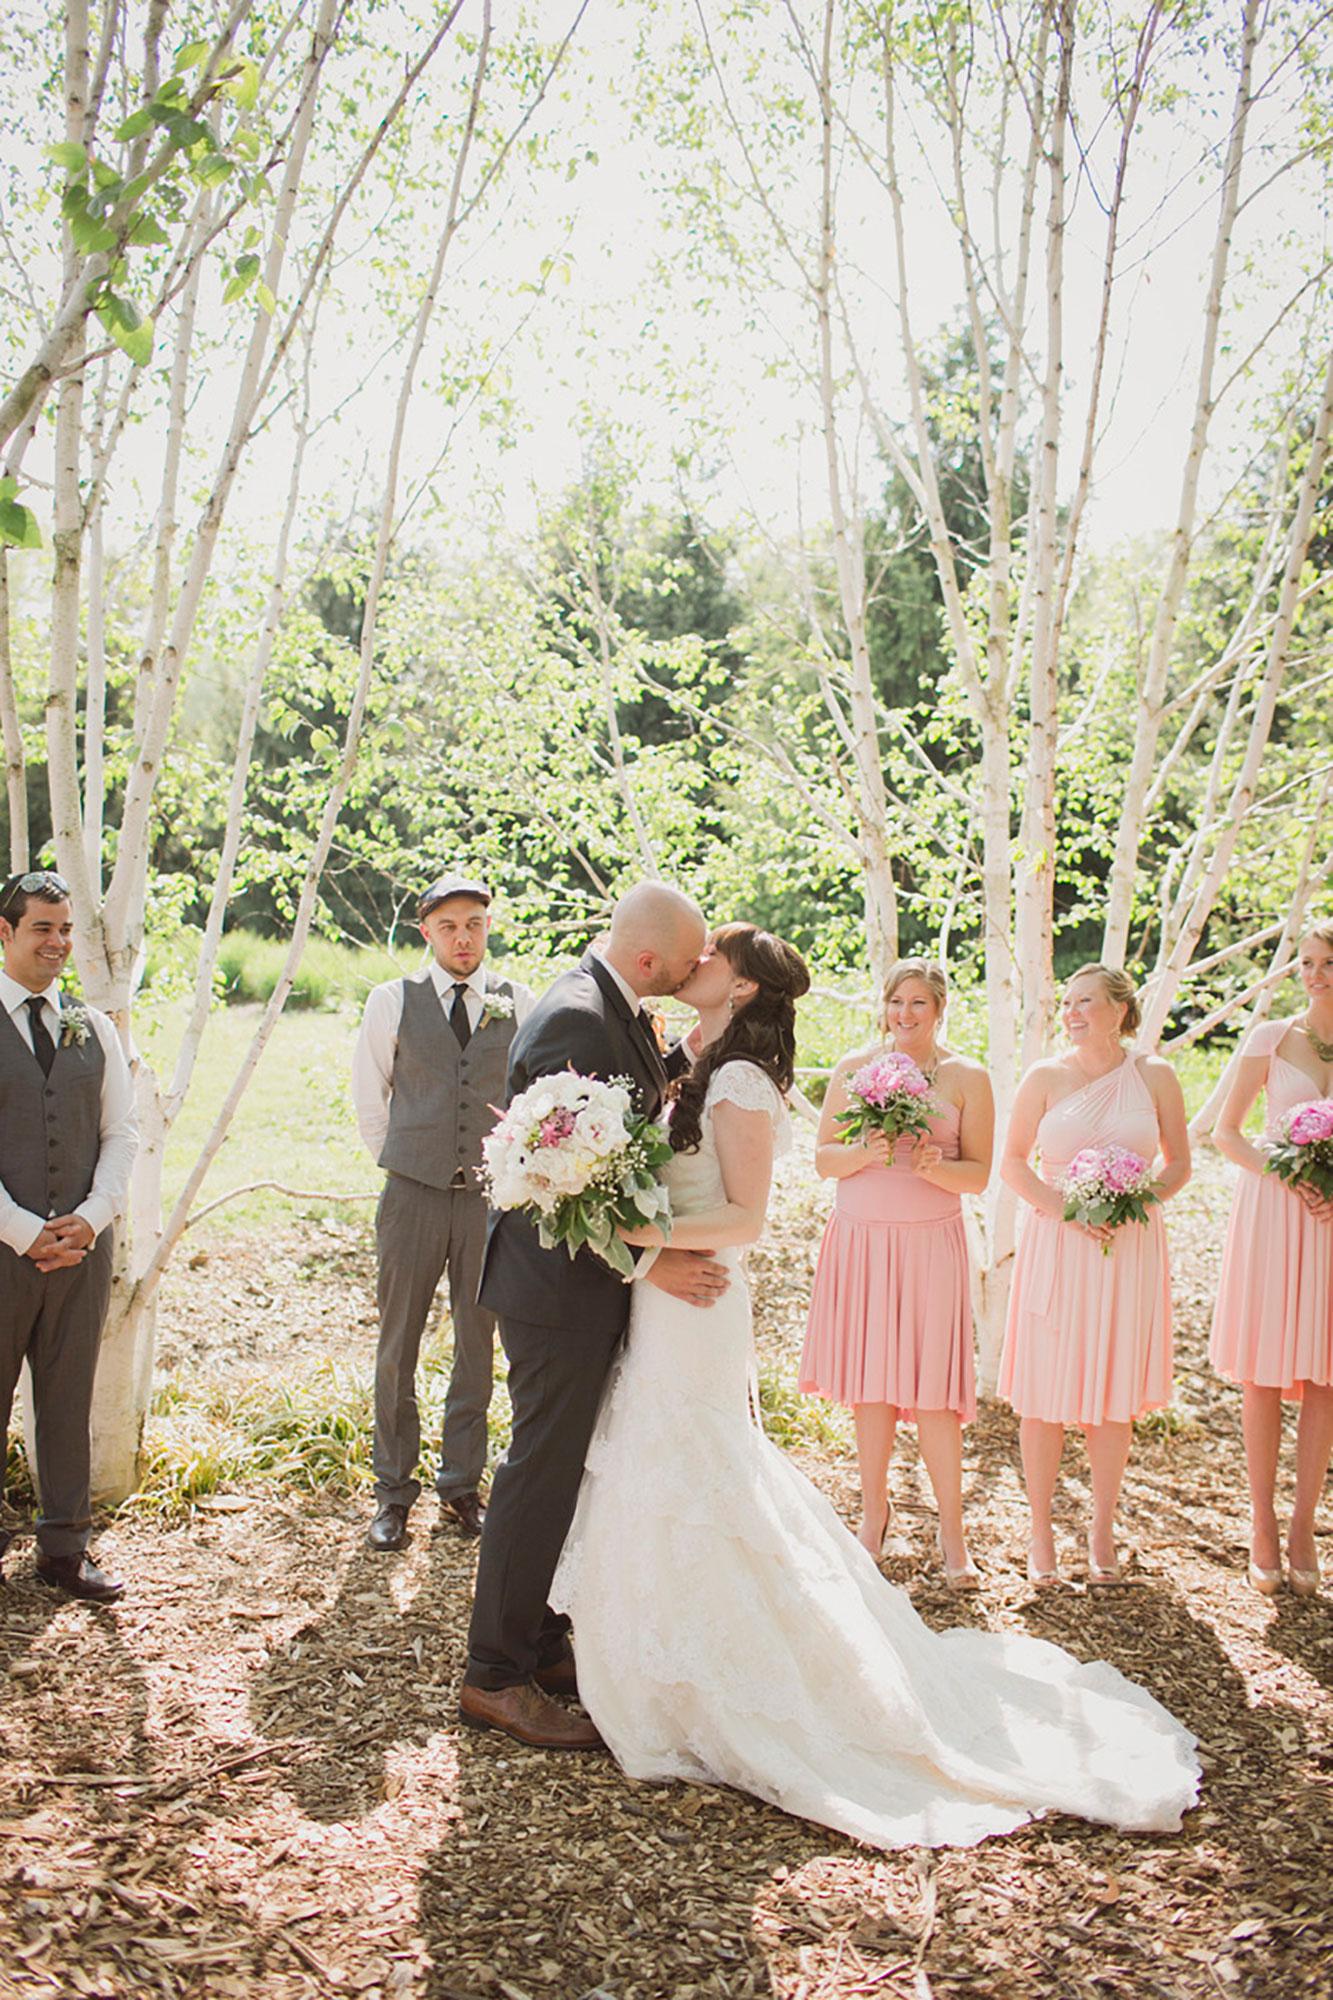 Balls-Falls-Vineyard-Bride-Photo-By-Elizabeth-in-Love-015.jpg